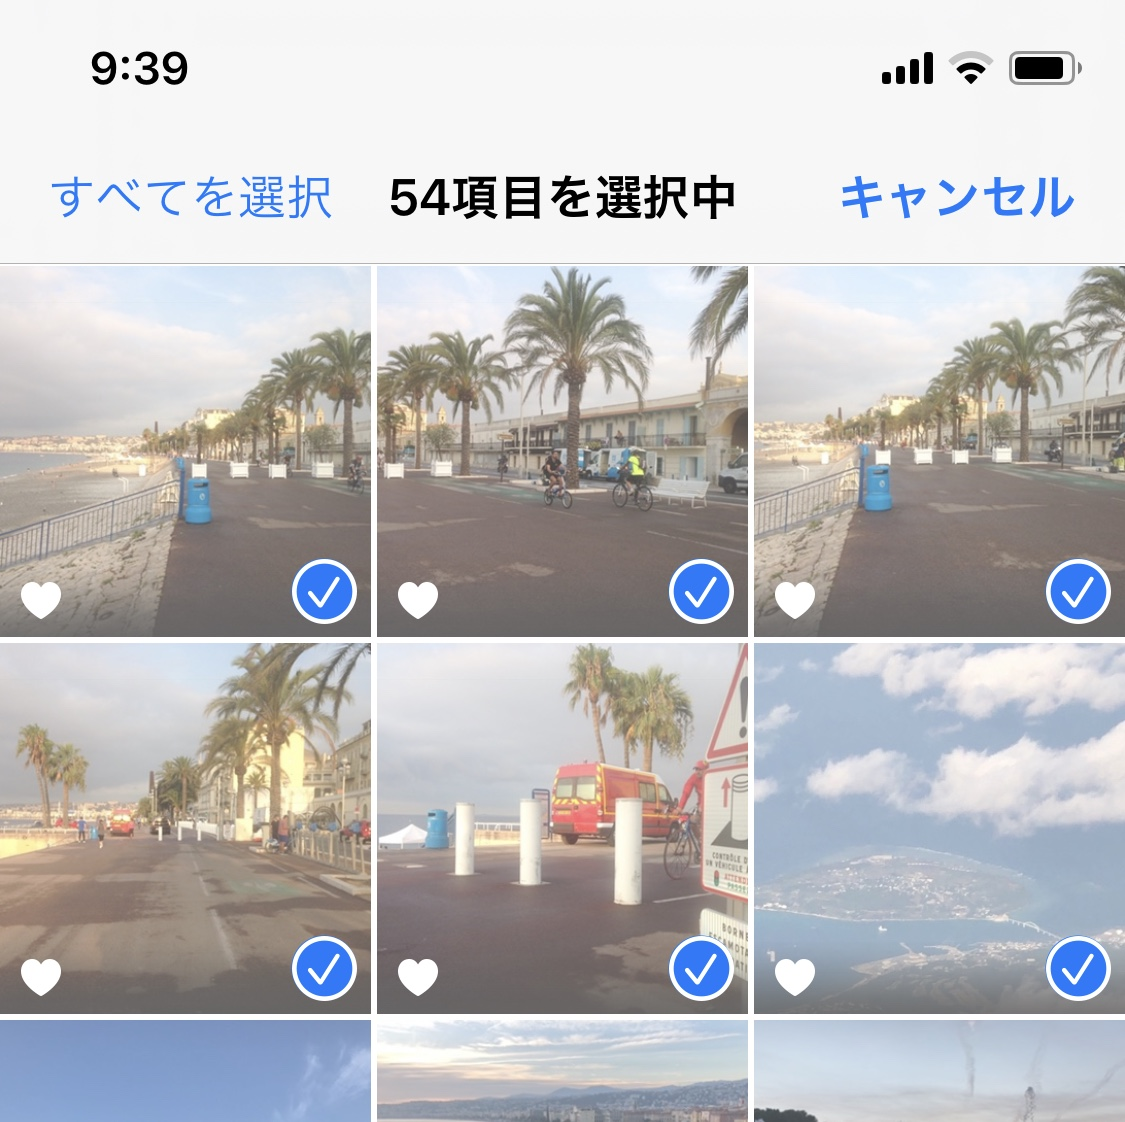 iPhoneでお気に入りを選択する画面